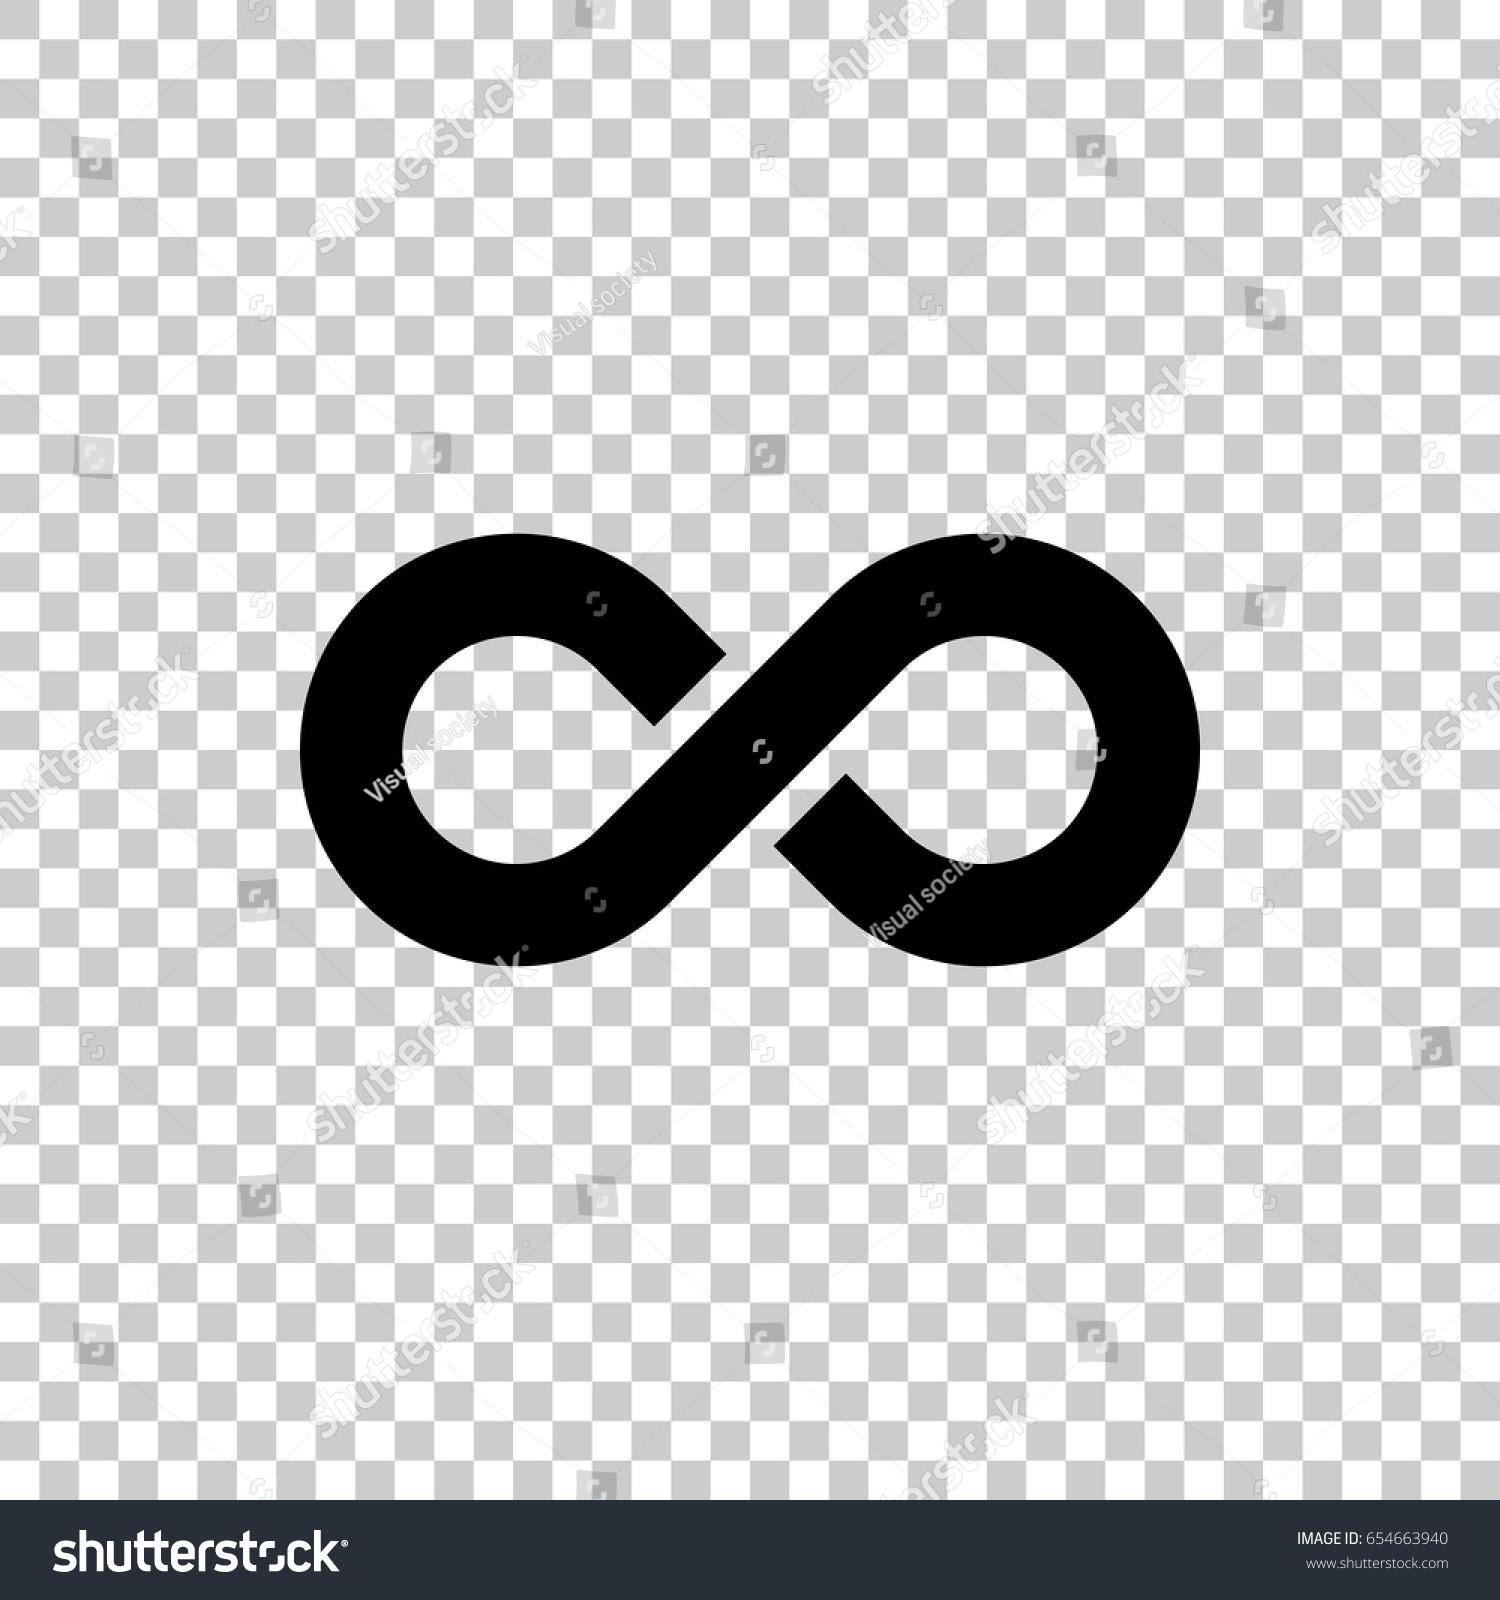 Infinity symbol isolated on transparent background stock vector infinity symbol isolated on transparent background black symbol for your design vector illustration biocorpaavc